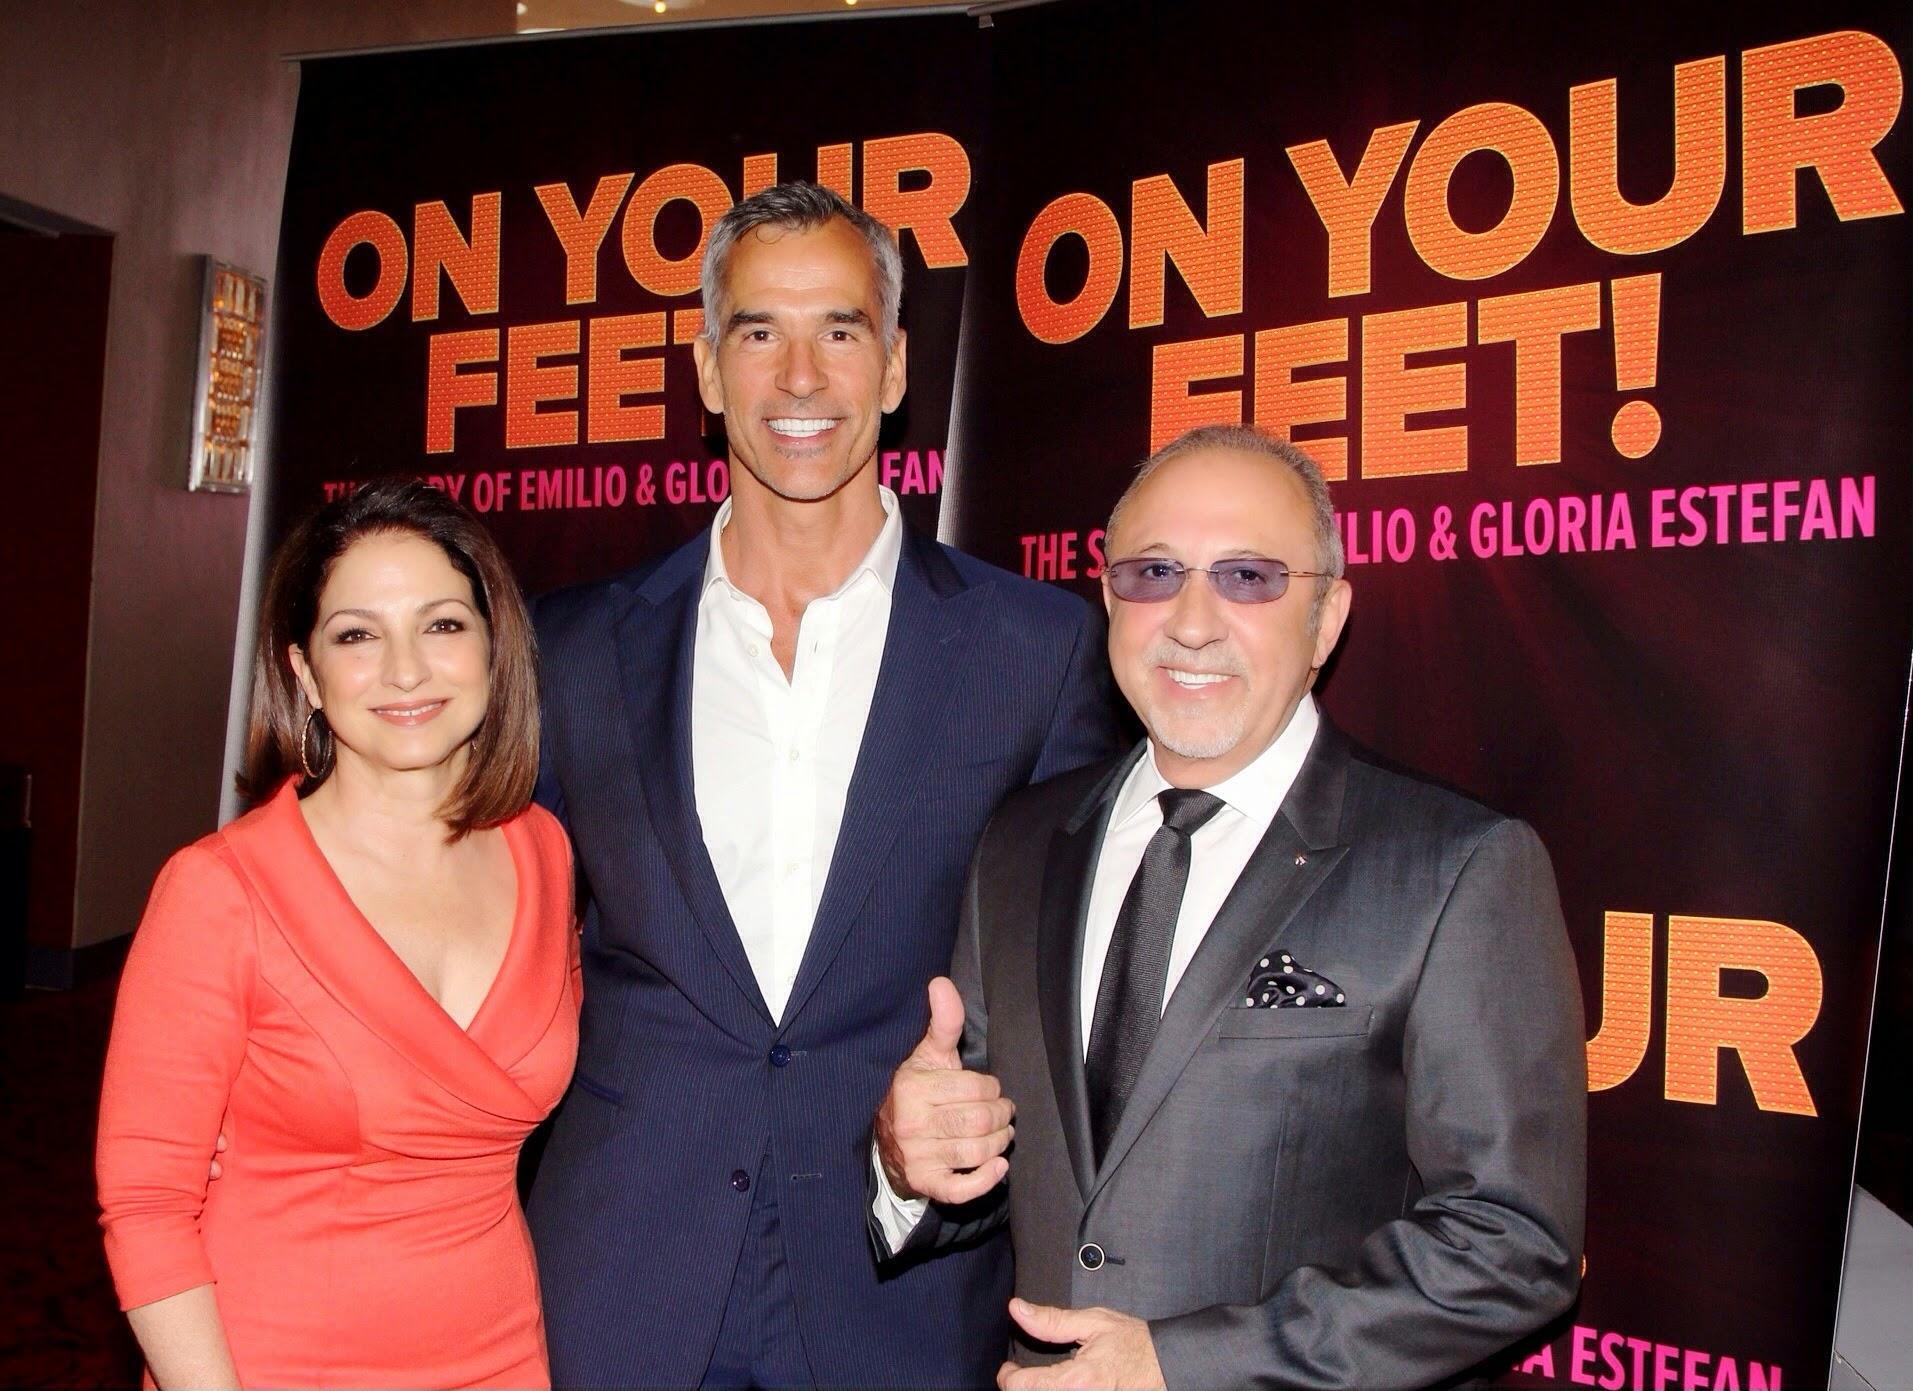 Emilio & Gloria Estefan with director Jerry Mitchell - Photo credit Bruce Glikas 2014